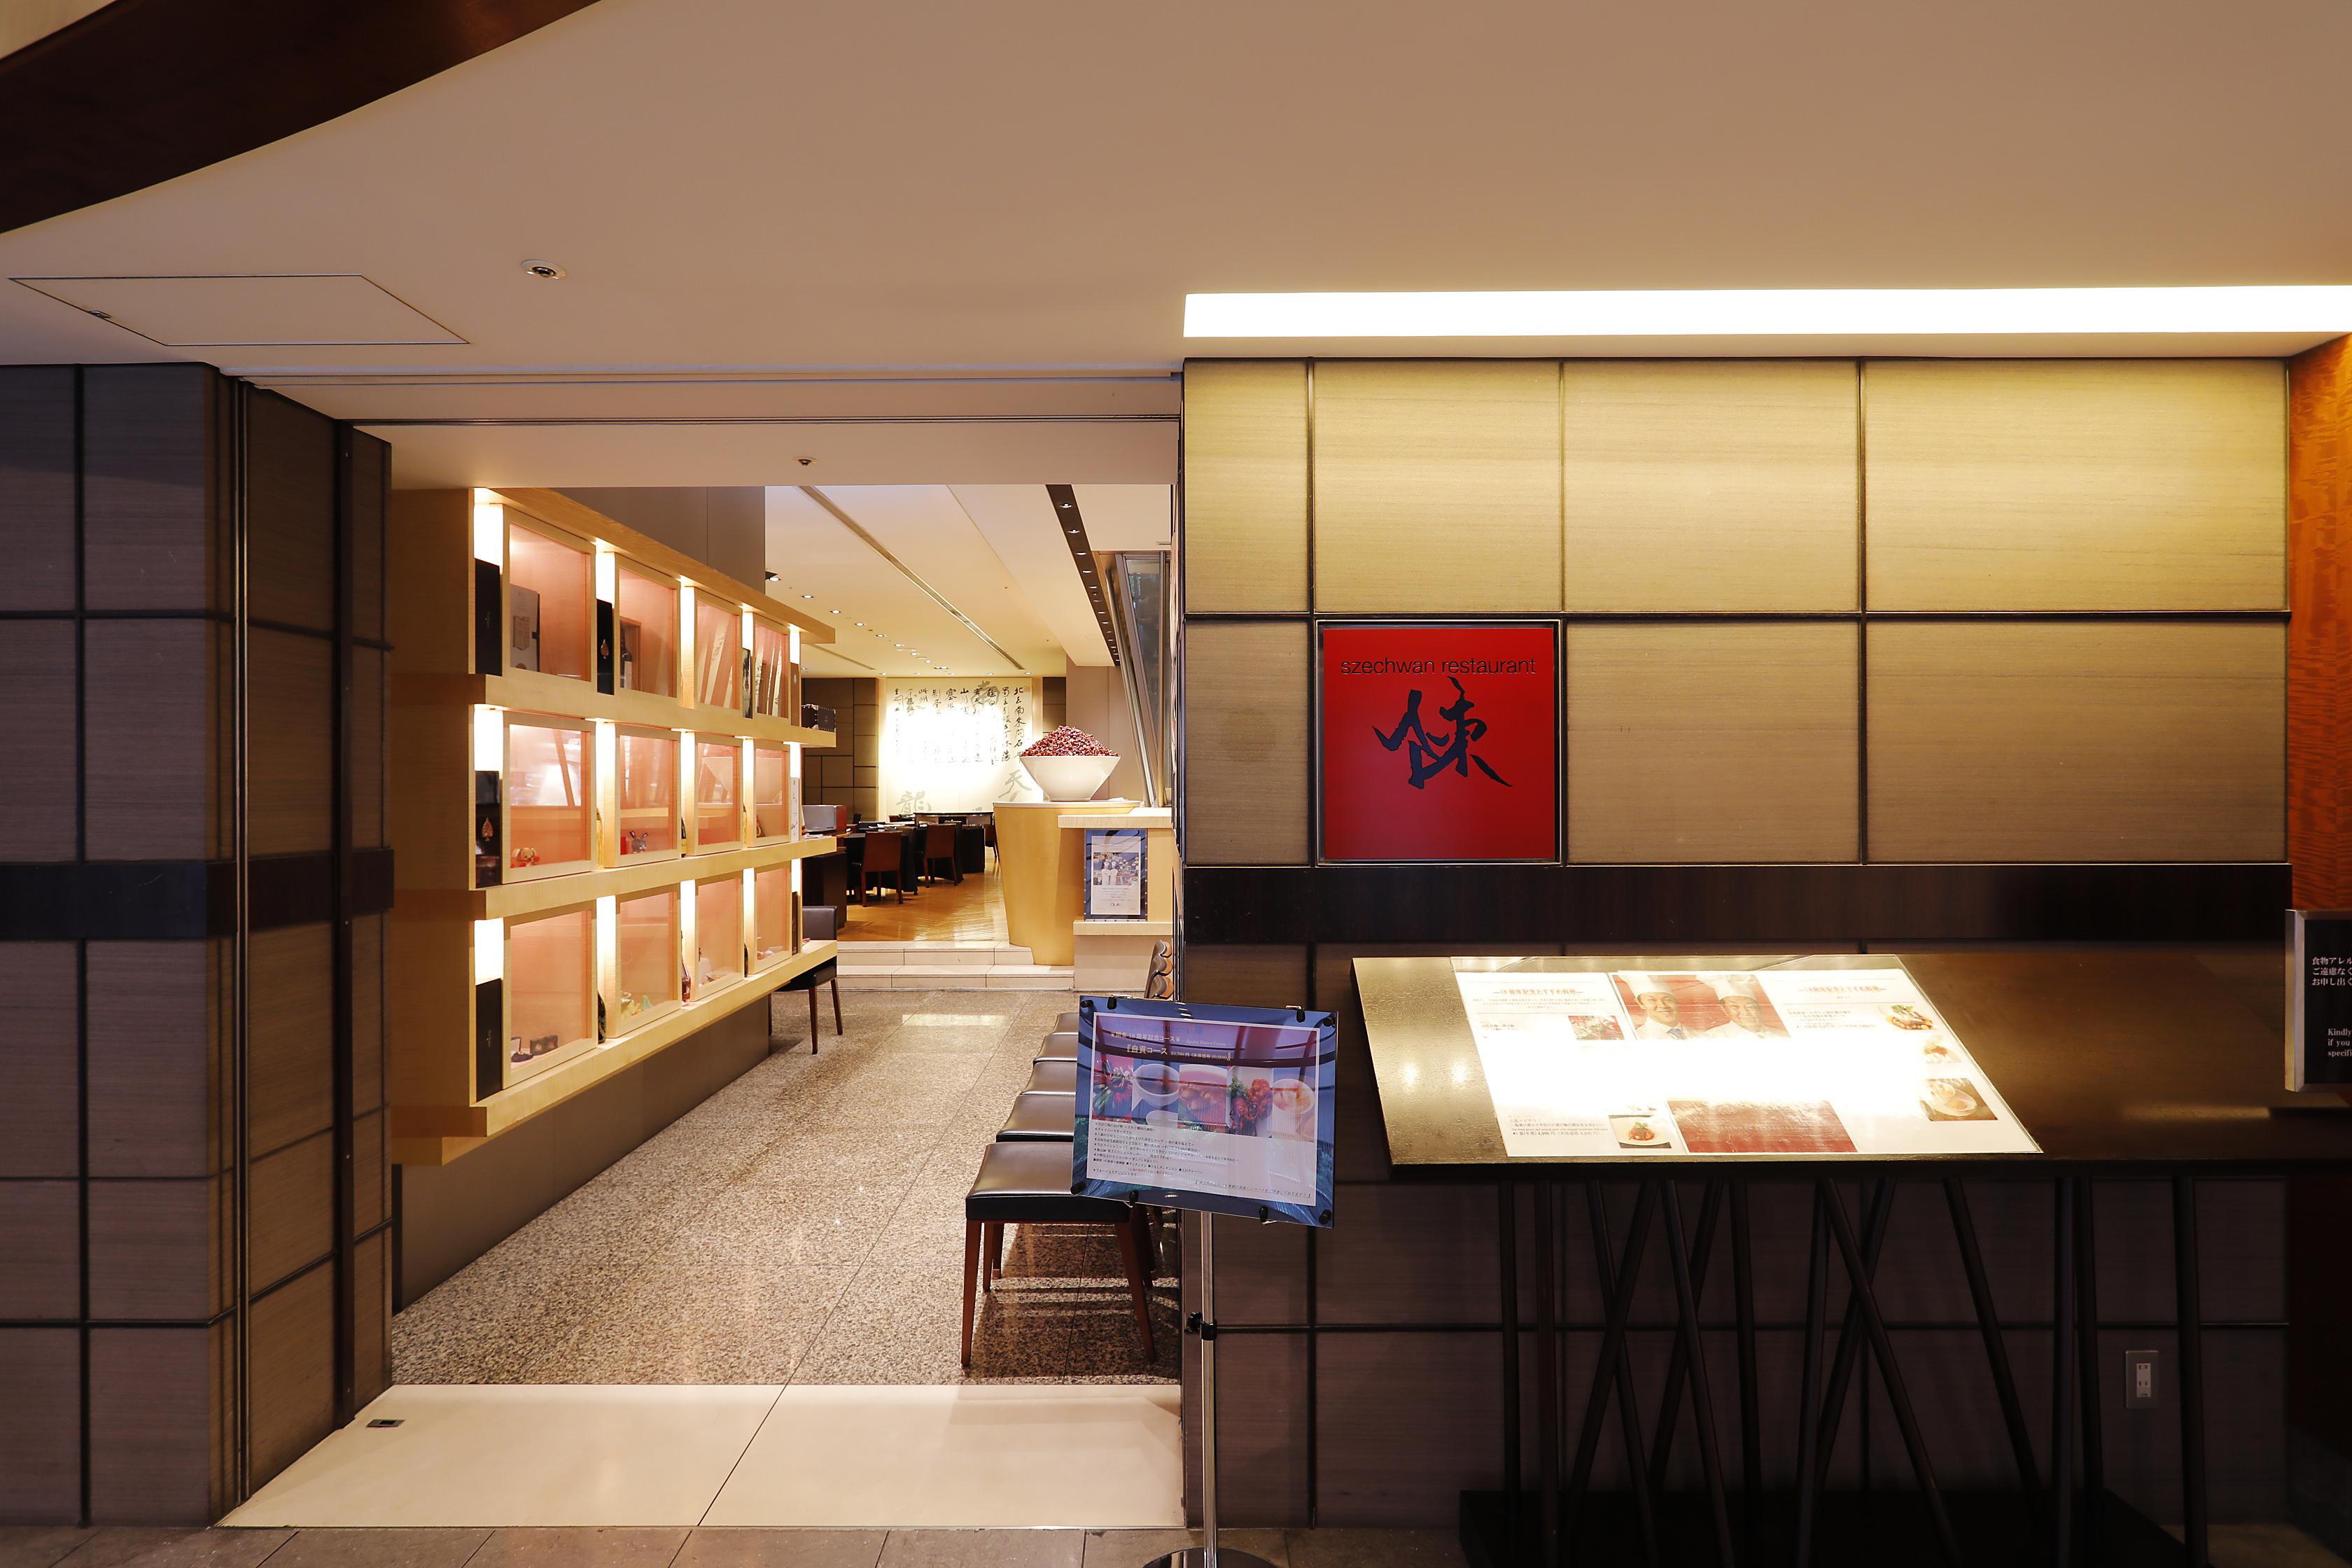 szechwan restaurant 陳(スーツァン・レストラン・チン)外観